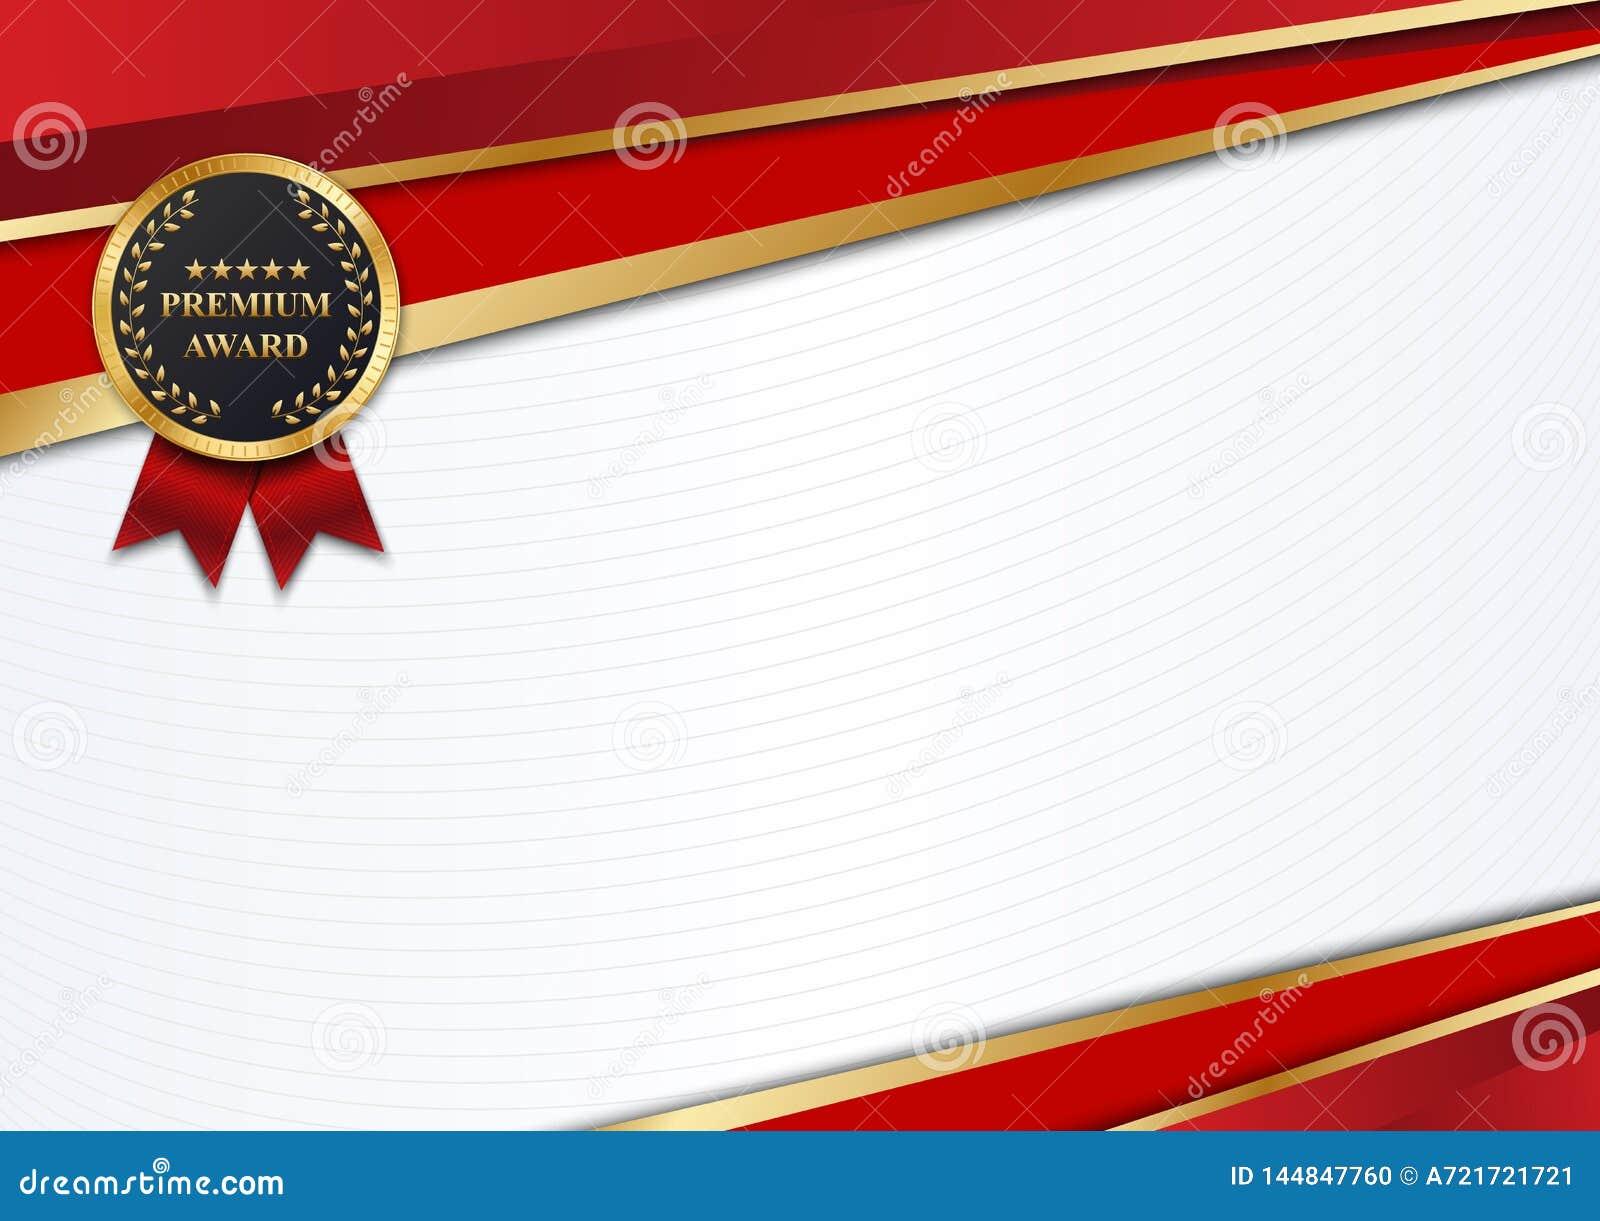 Creative Illustration Of Stylish Certificate Template Of Appreciation Award Isolated On Background Art Design Modern Winner Blank Stock Illustration Illustration Of Elegant Paper 144847760,80s Designer Imposters Body Spray